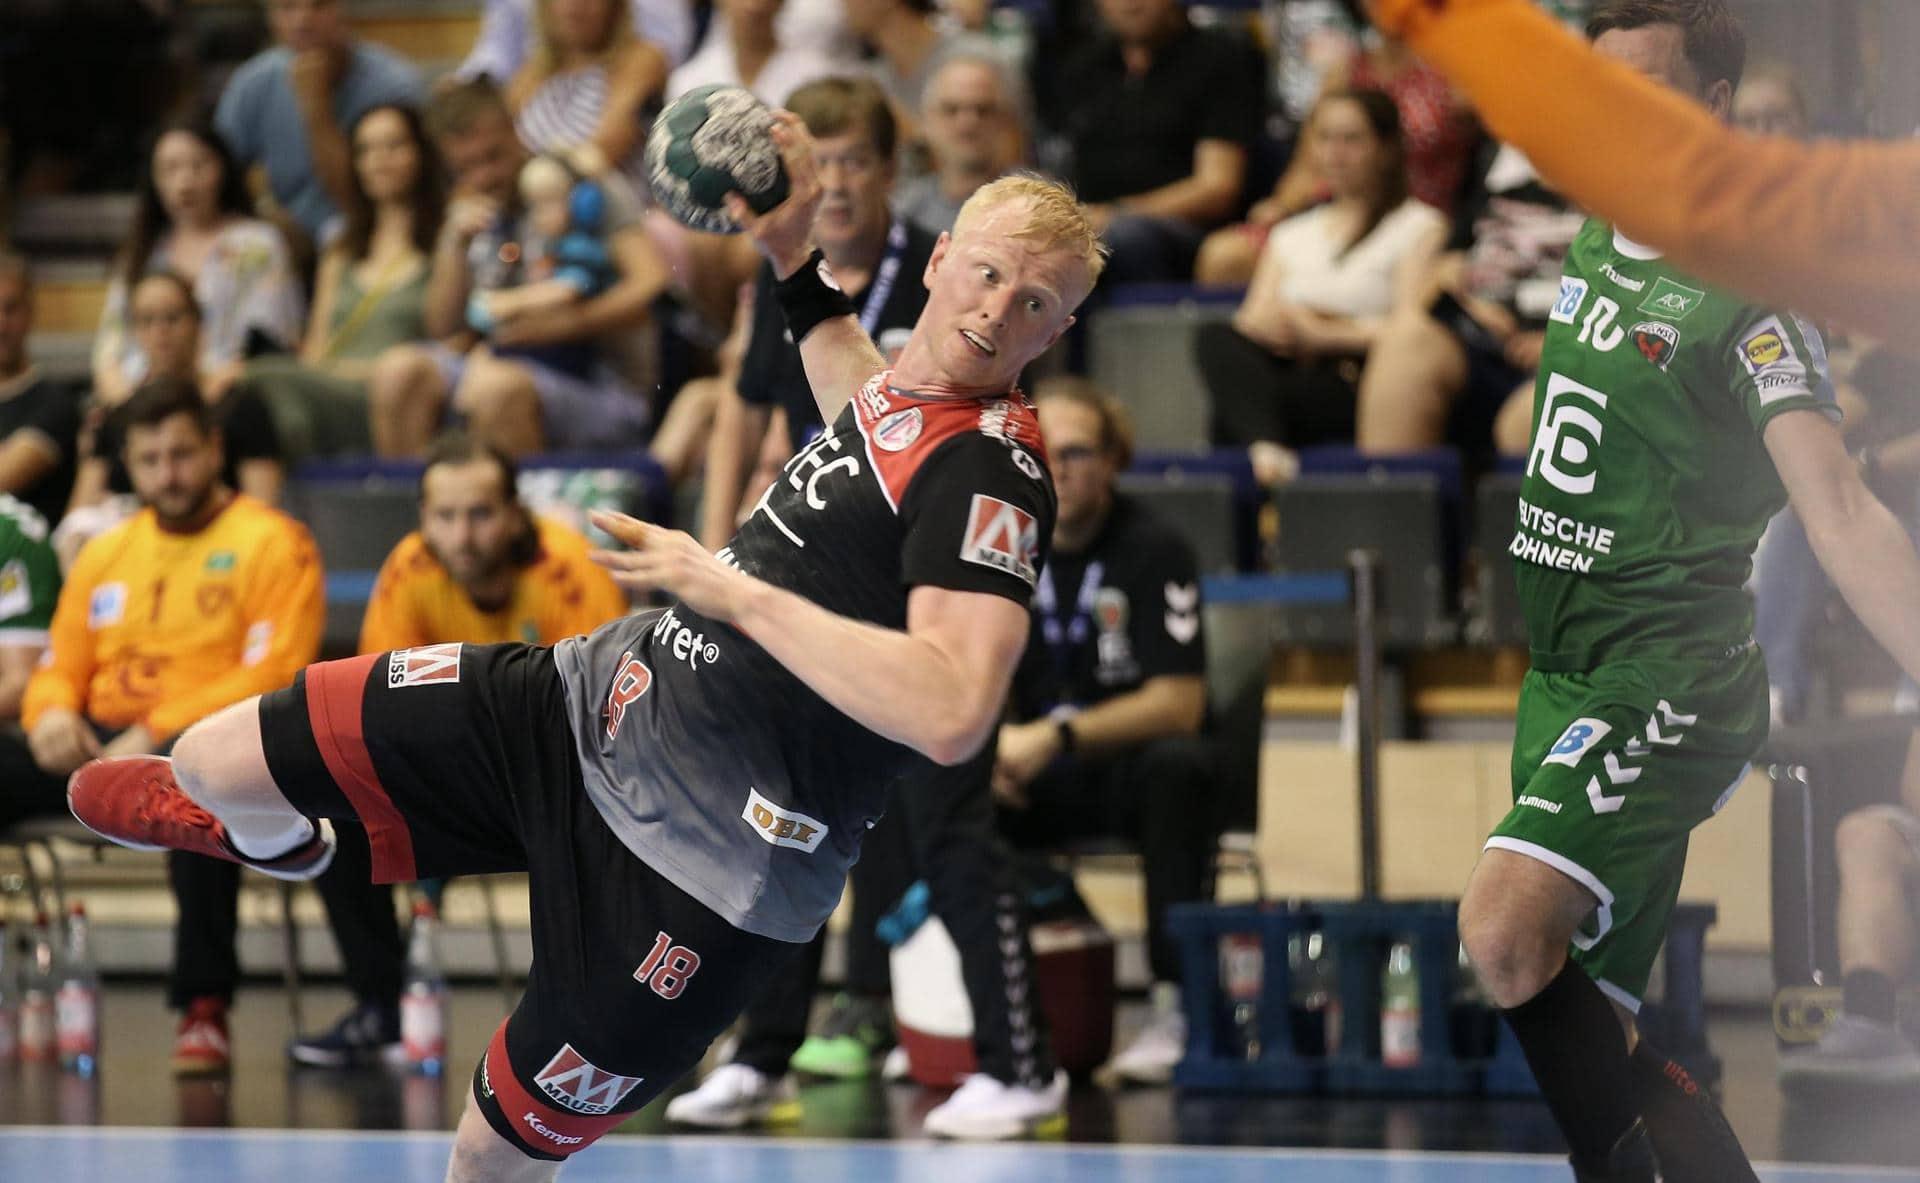 Erlangens Handballchef: WM in Ägypten «ein Wahnsinn» Kritik an Corona-Konzept